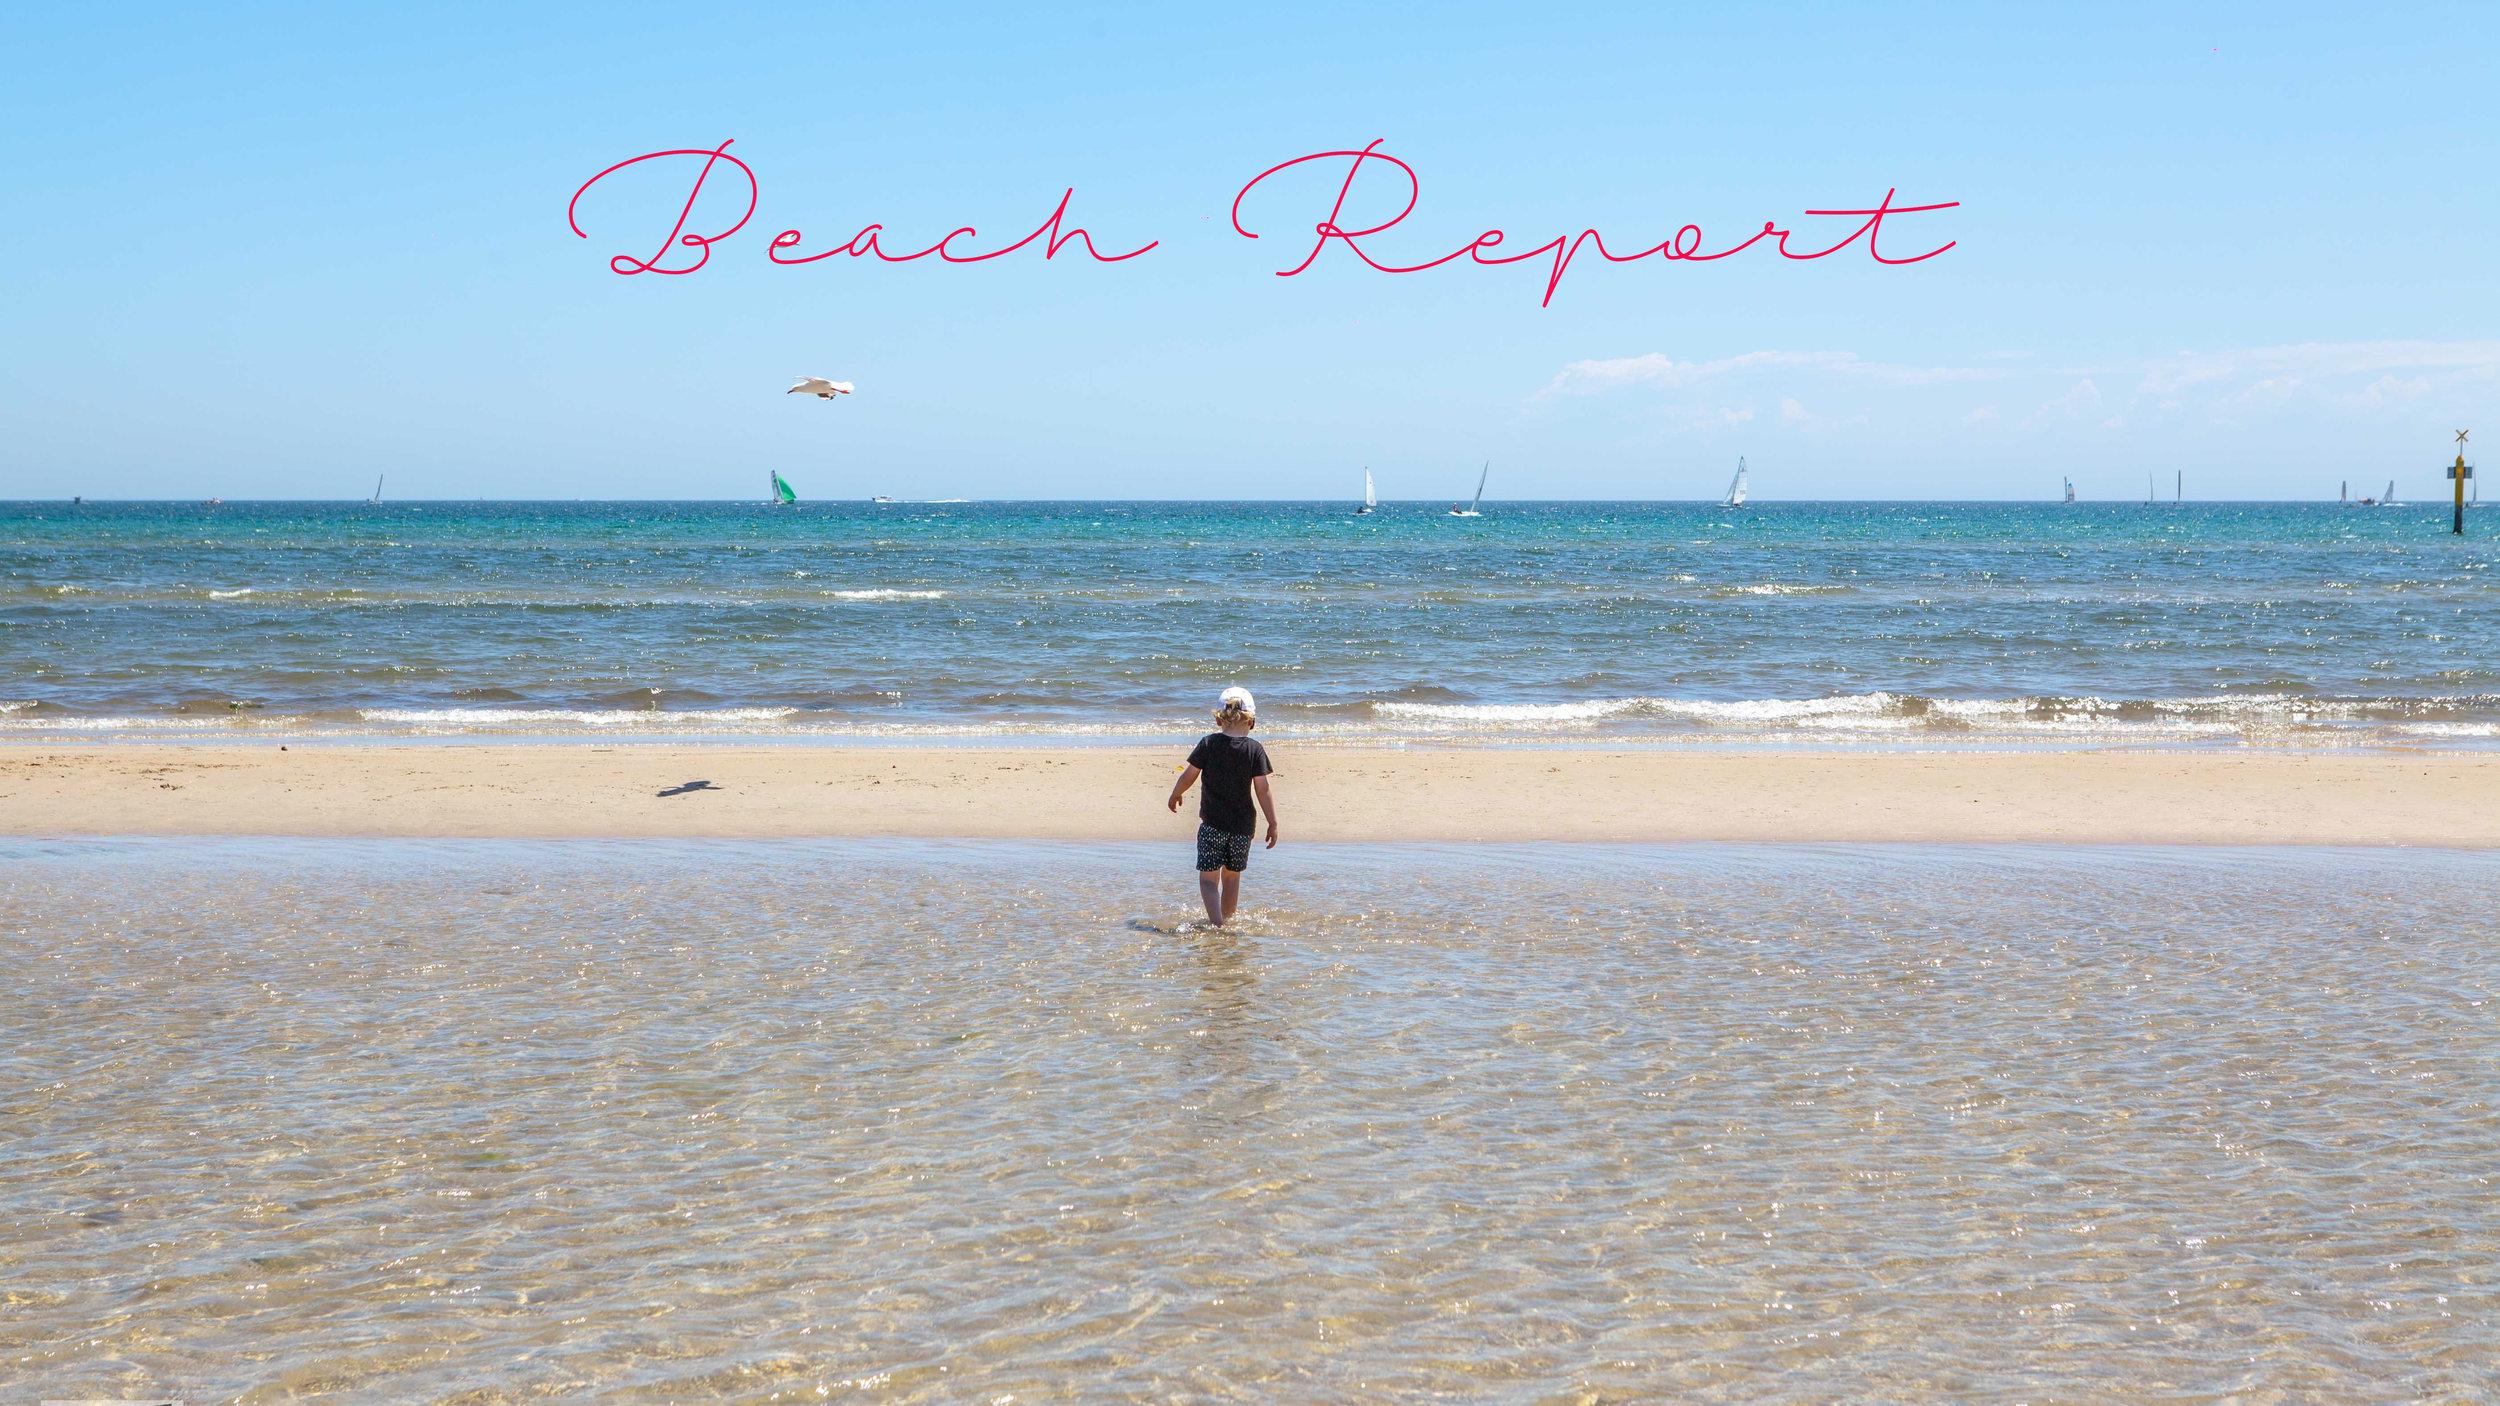 Mamma Knows South - Beach Report